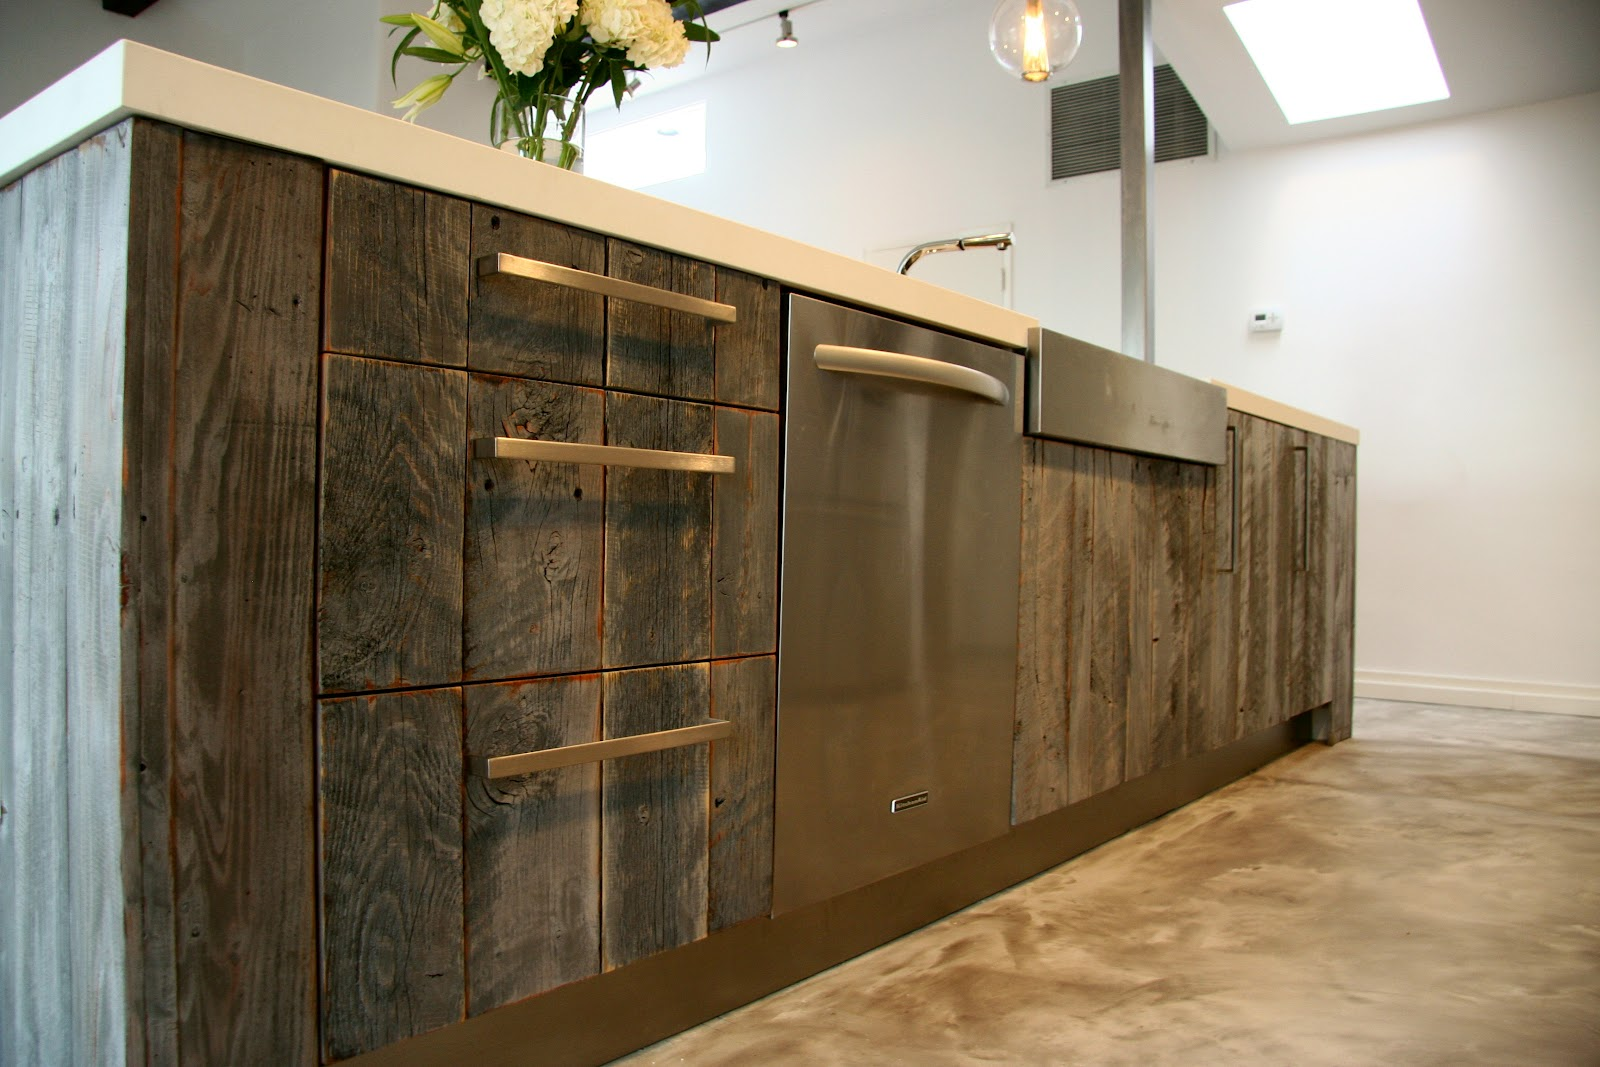 semihandmade reclaimed lumber kitchen. Black Bedroom Furniture Sets. Home Design Ideas